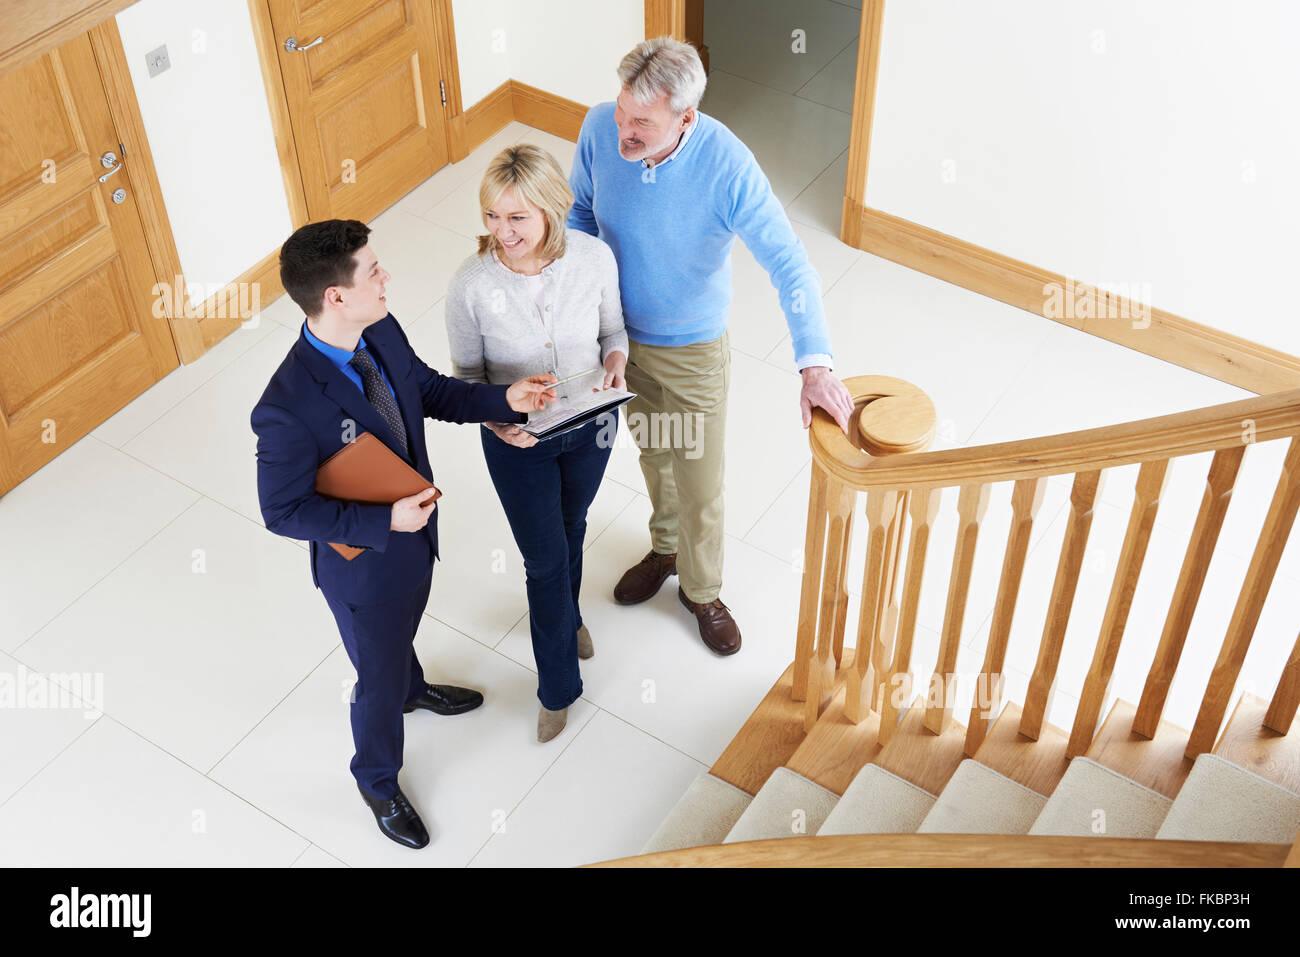 home ownership stockfotos home ownership bilder alamy. Black Bedroom Furniture Sets. Home Design Ideas